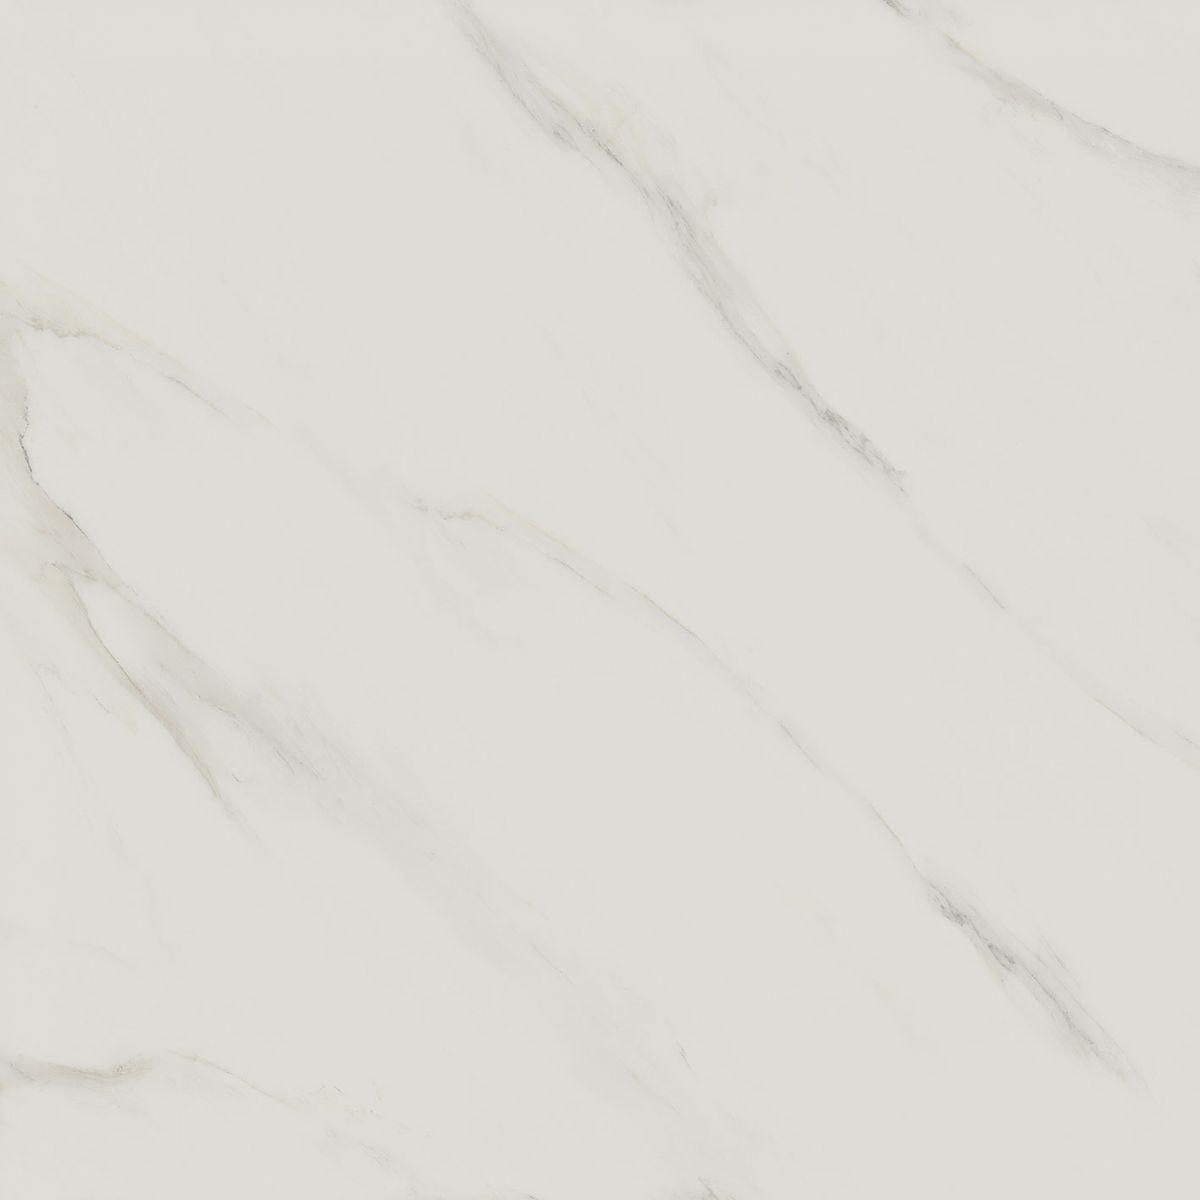 Gạch Porcelain 600x600 Viglacera VG6001 giá rẻ